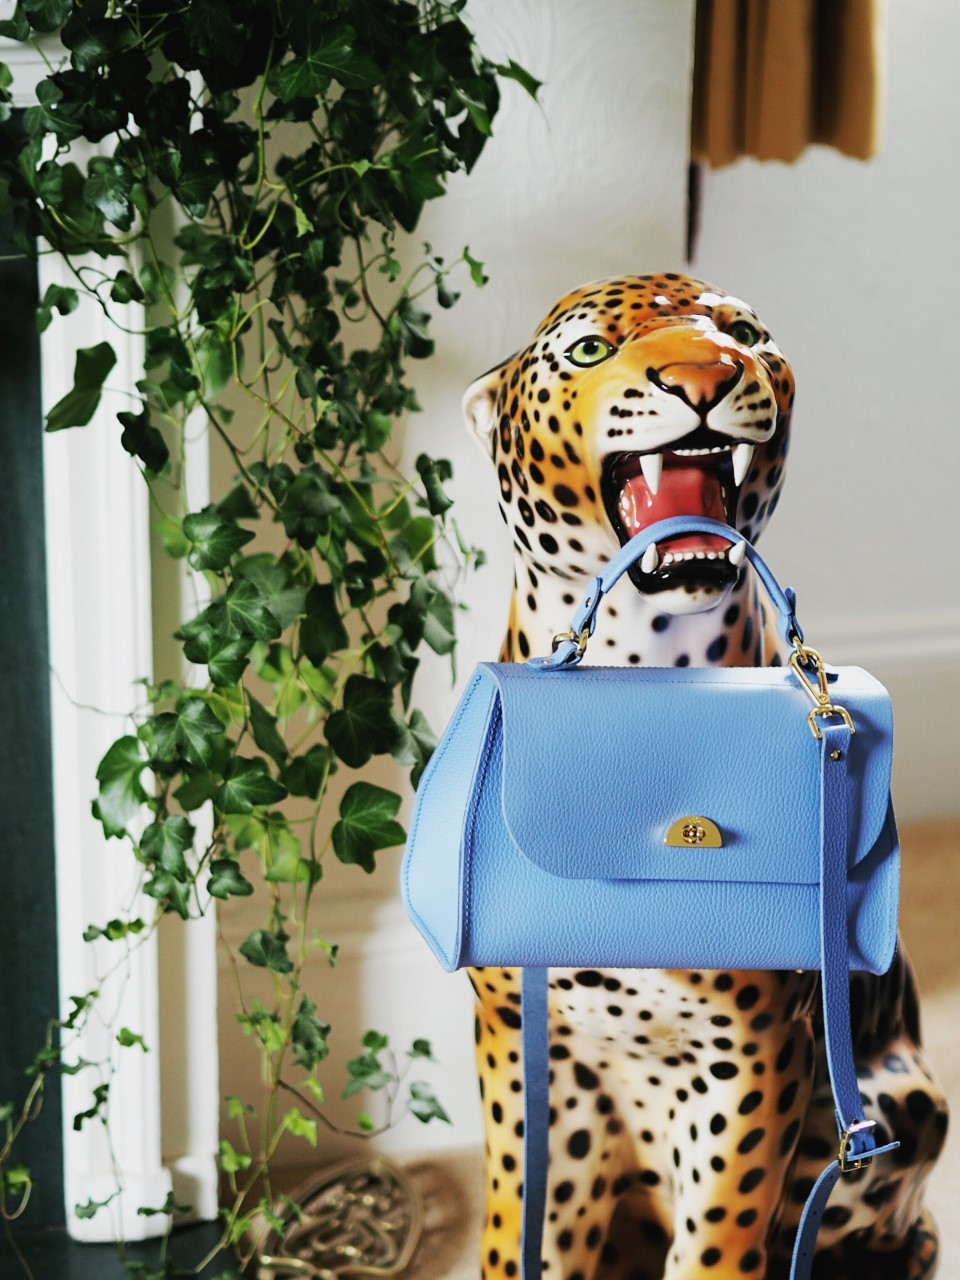 Cambridge Satchel Company Bag Review handbag daisy poppy review uk 2021